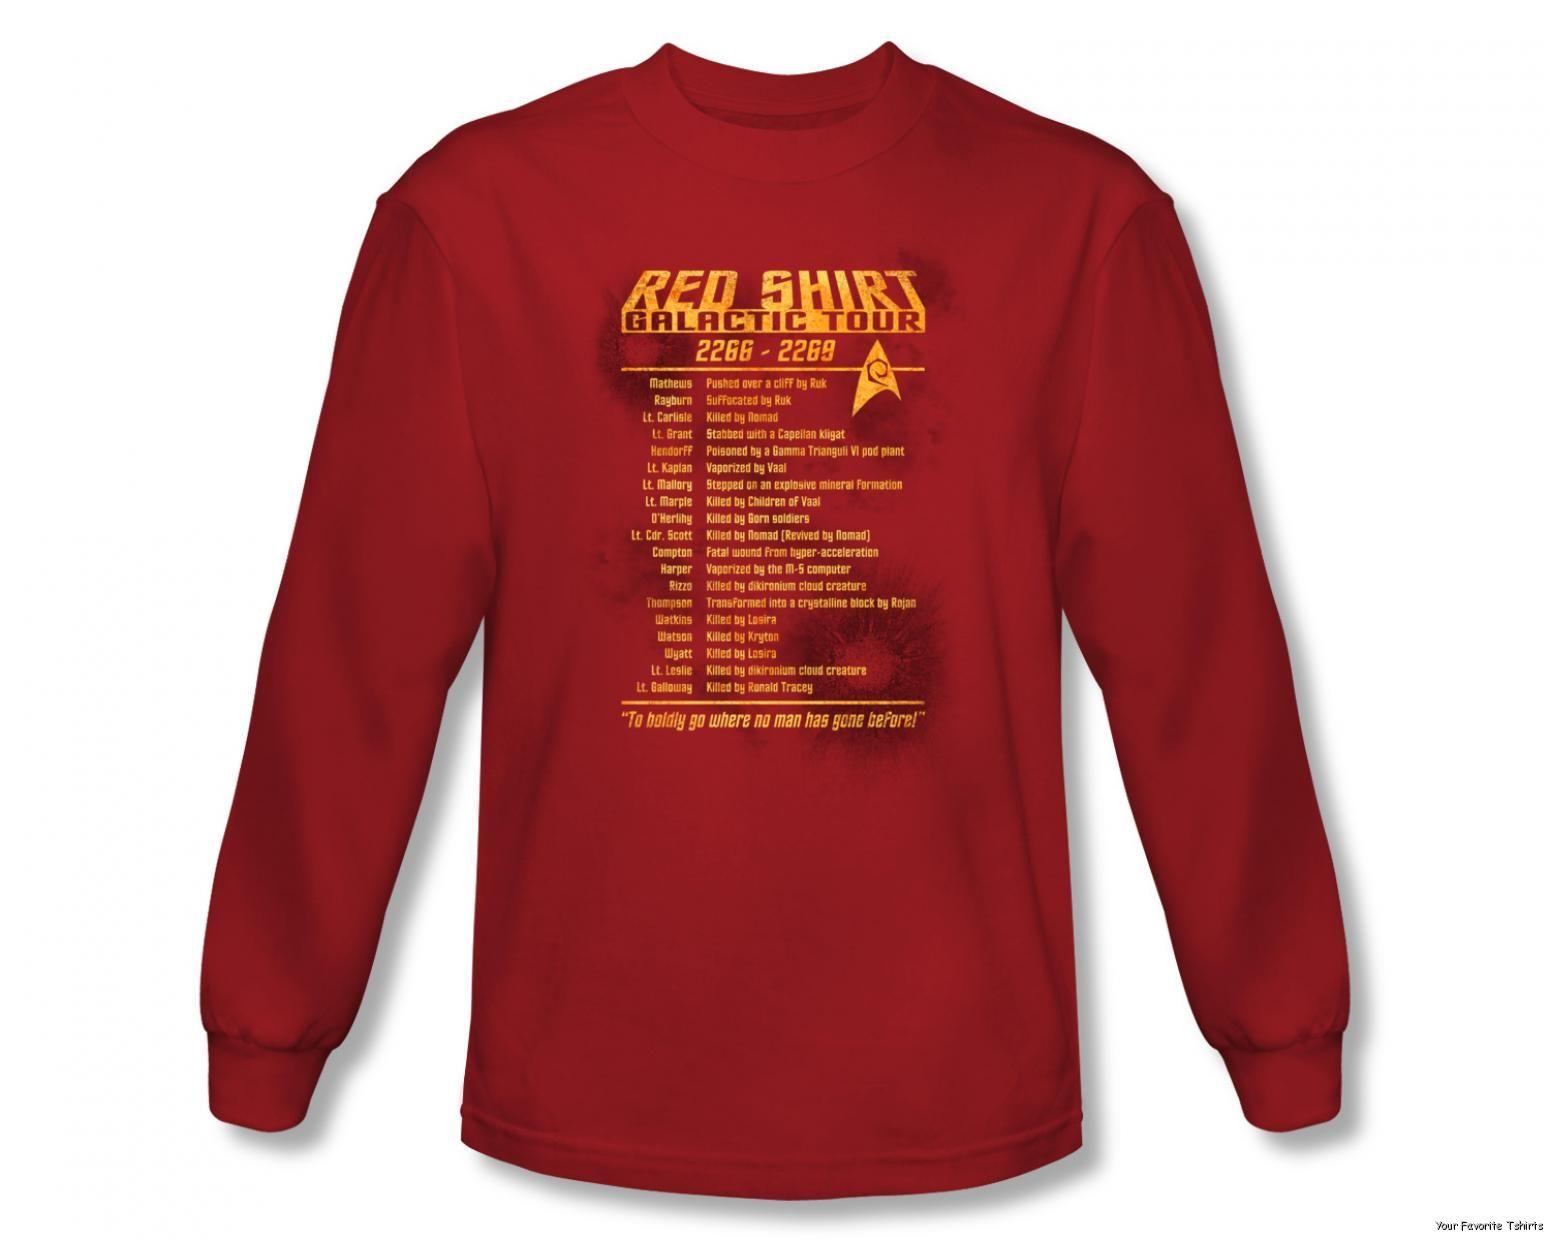 Star trek red shirt symbol star trek red shirt symbol view symbol view symbol buycottarizona